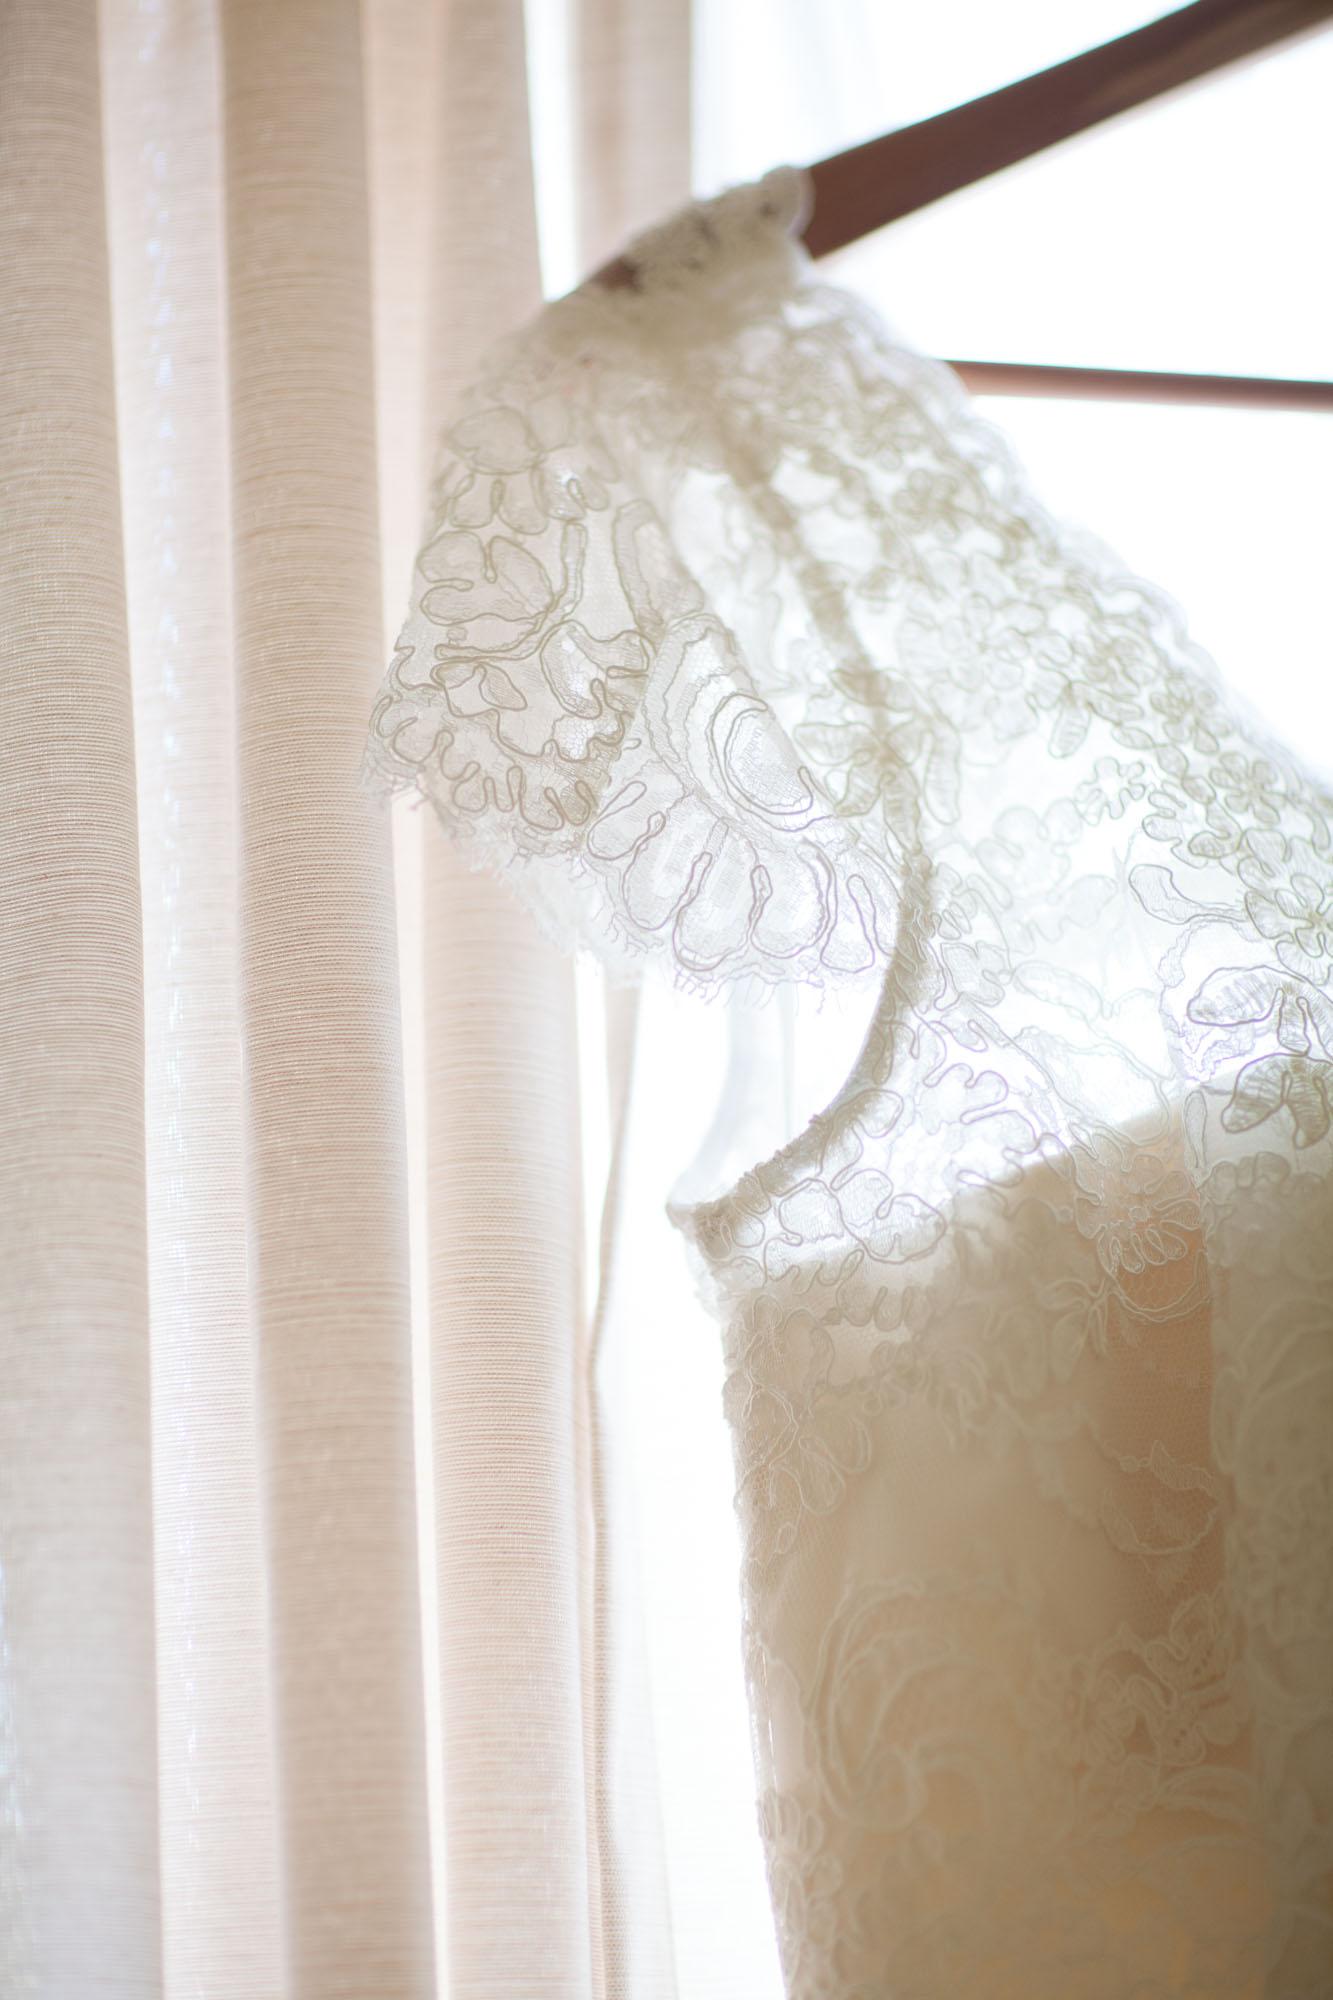 Gretchen_Gause_Petaluma_Olympias_Valley_Wedding_Photo-018.jpg